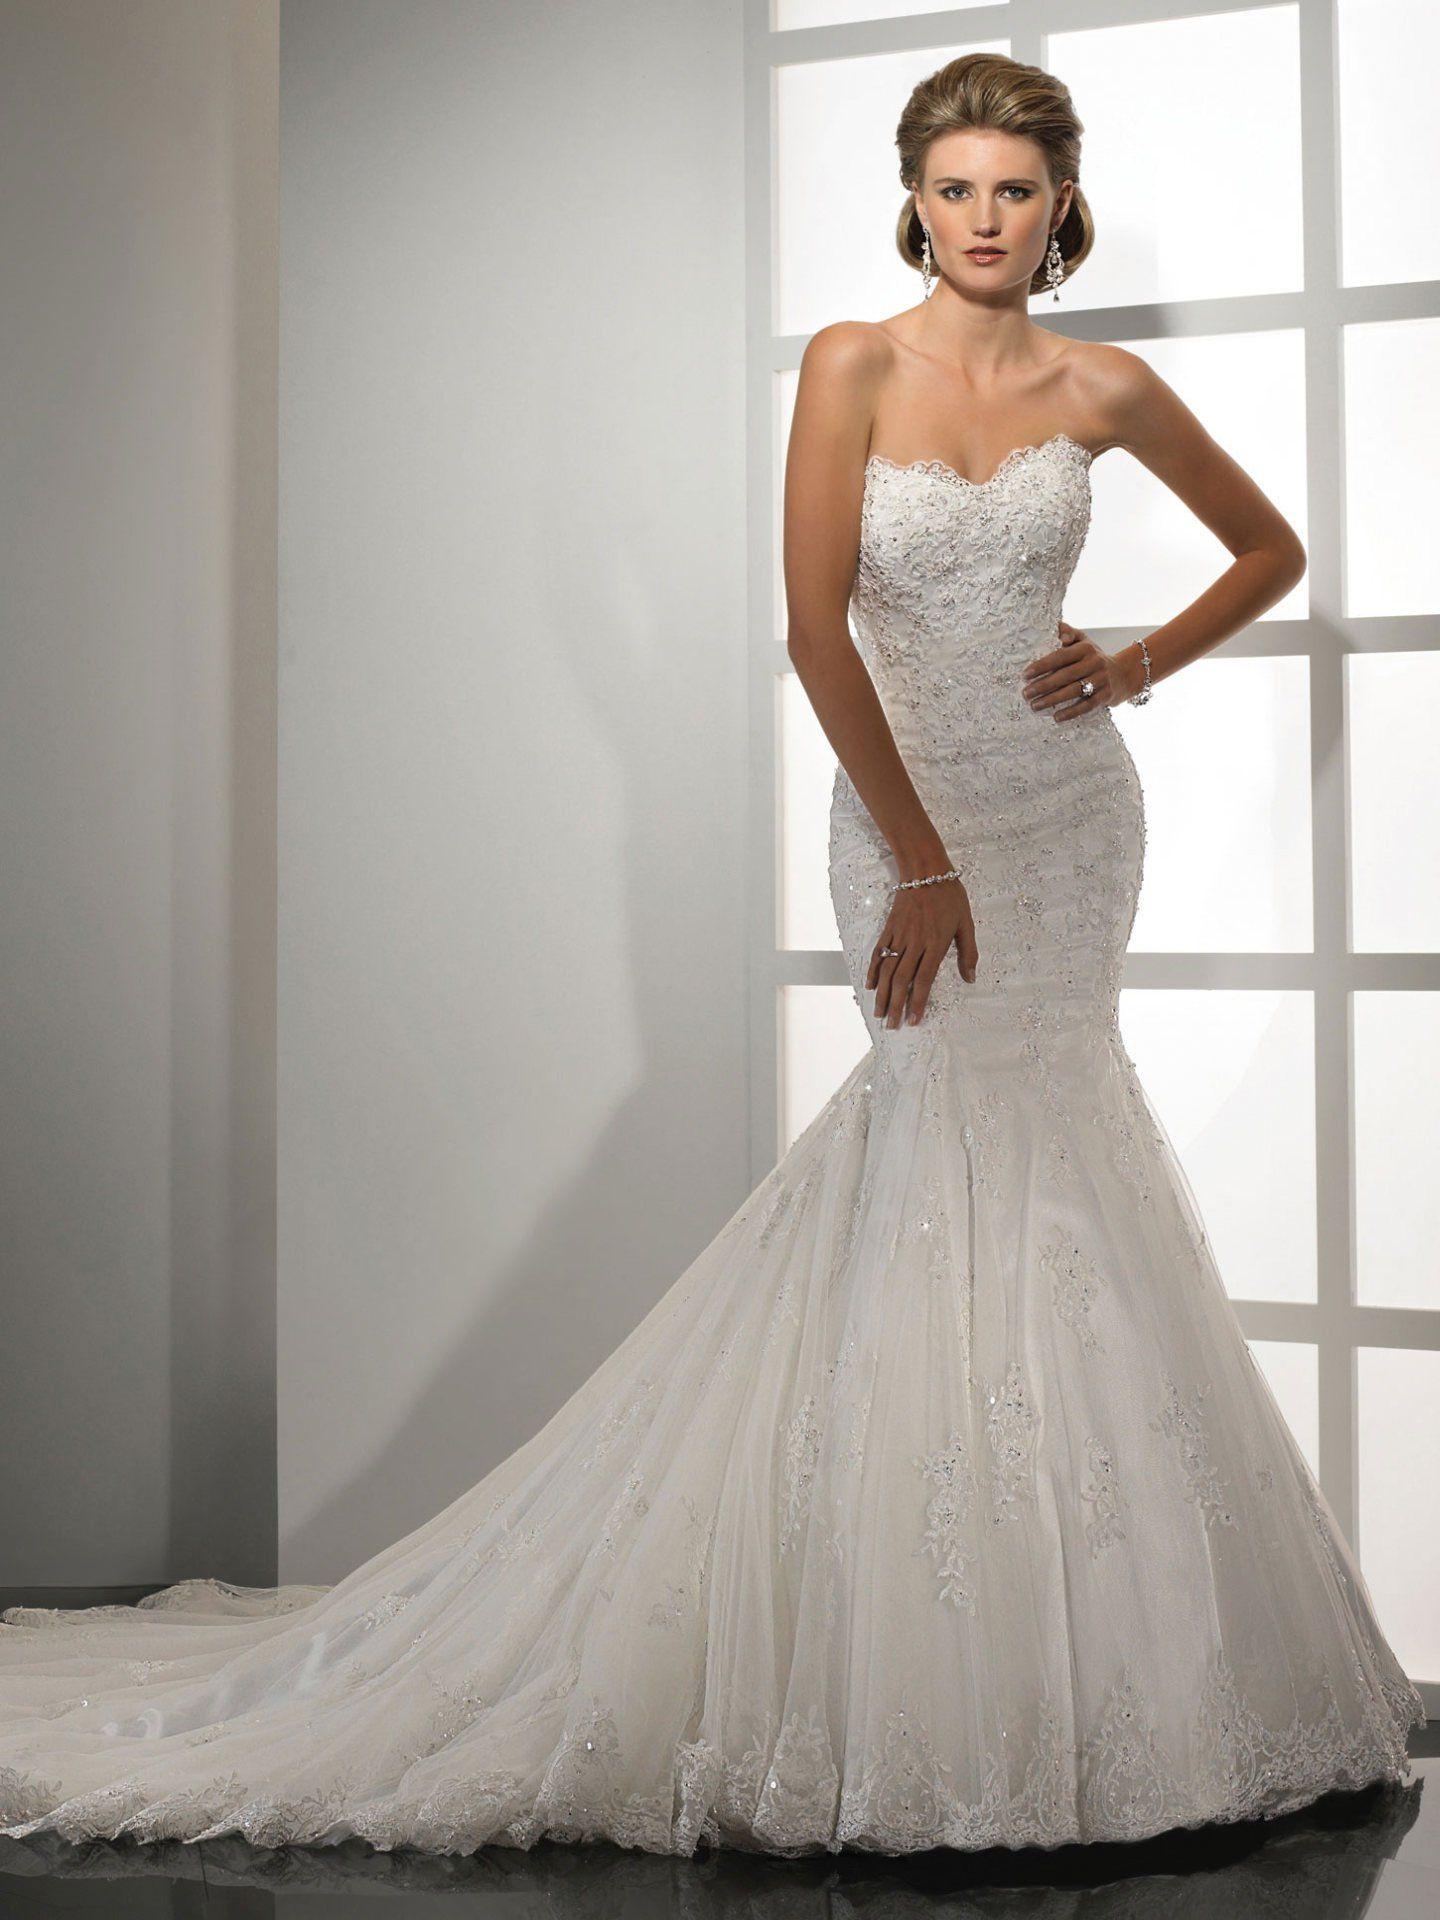 35+ The perfect dress sarasota fl info